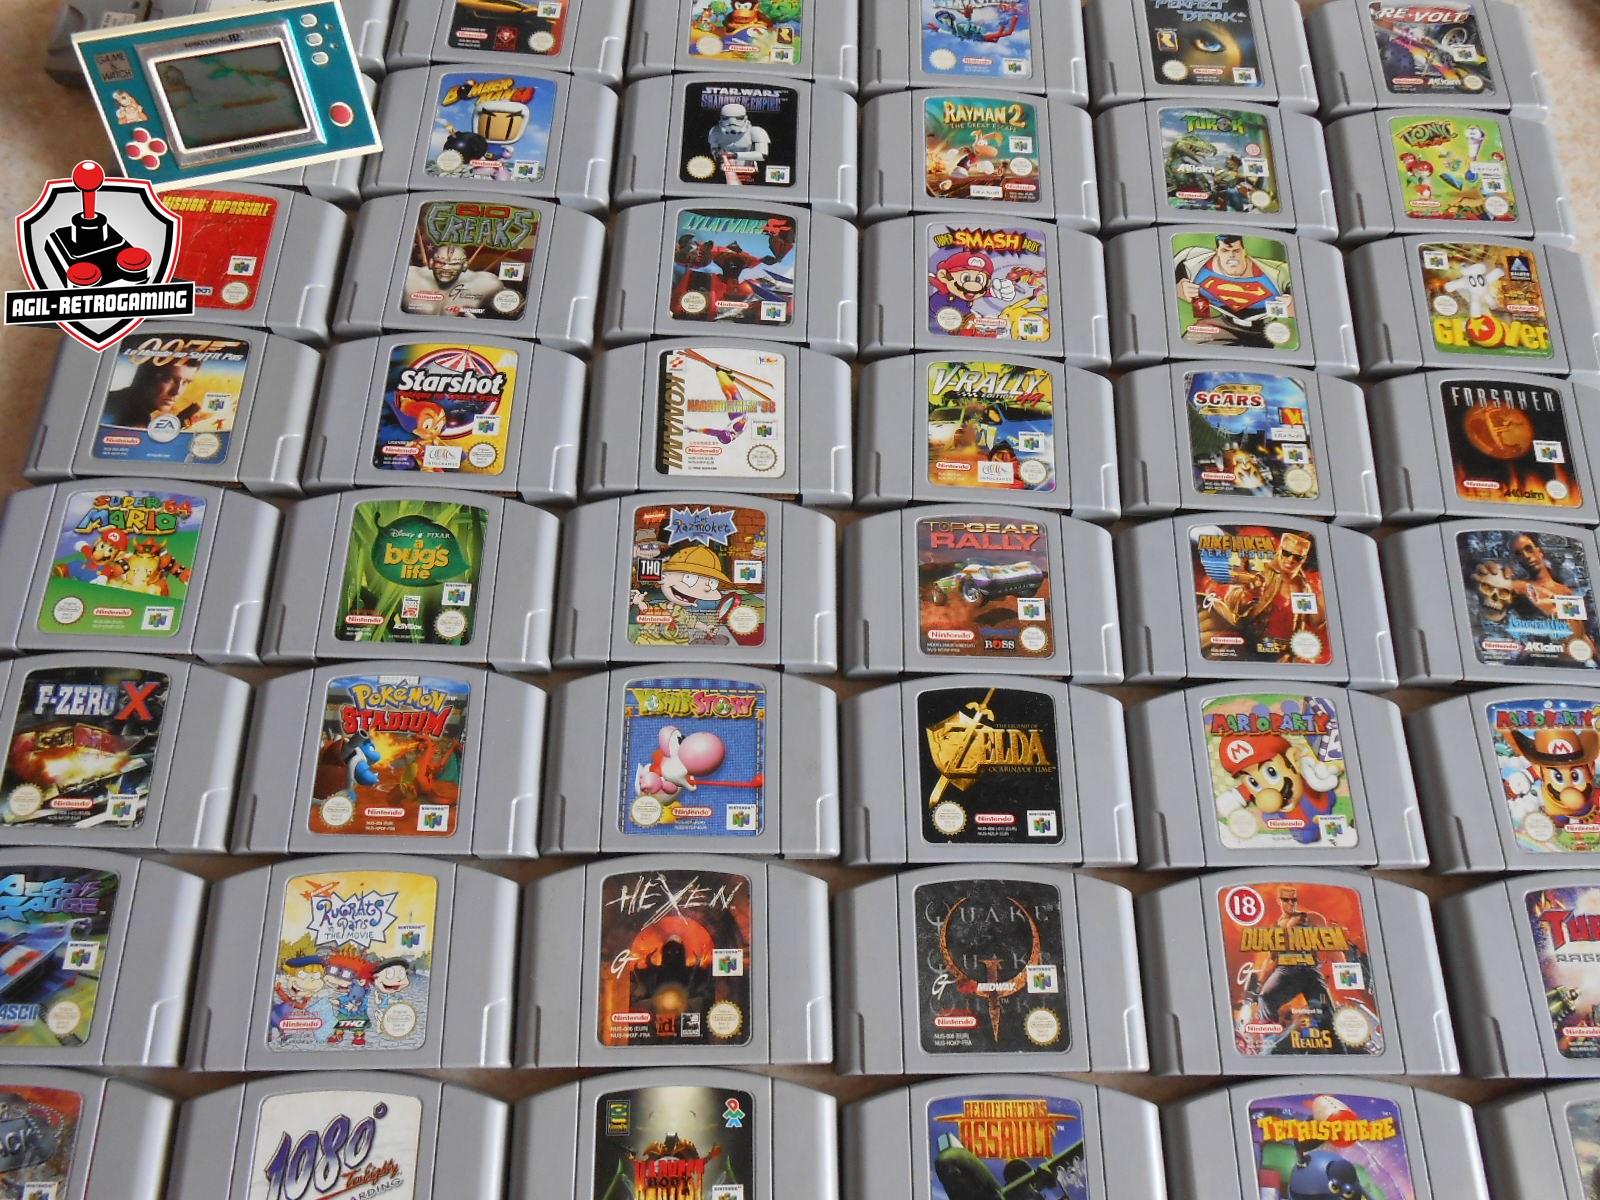 Nouveautés Nintendo 64 - N64 : Zelda OOT, Super Smash Bros, DKR, Rayman 2, Yoshi's Story, Mario Party 1 & 2, Quake, Duke Nukem, Turok, Hexen